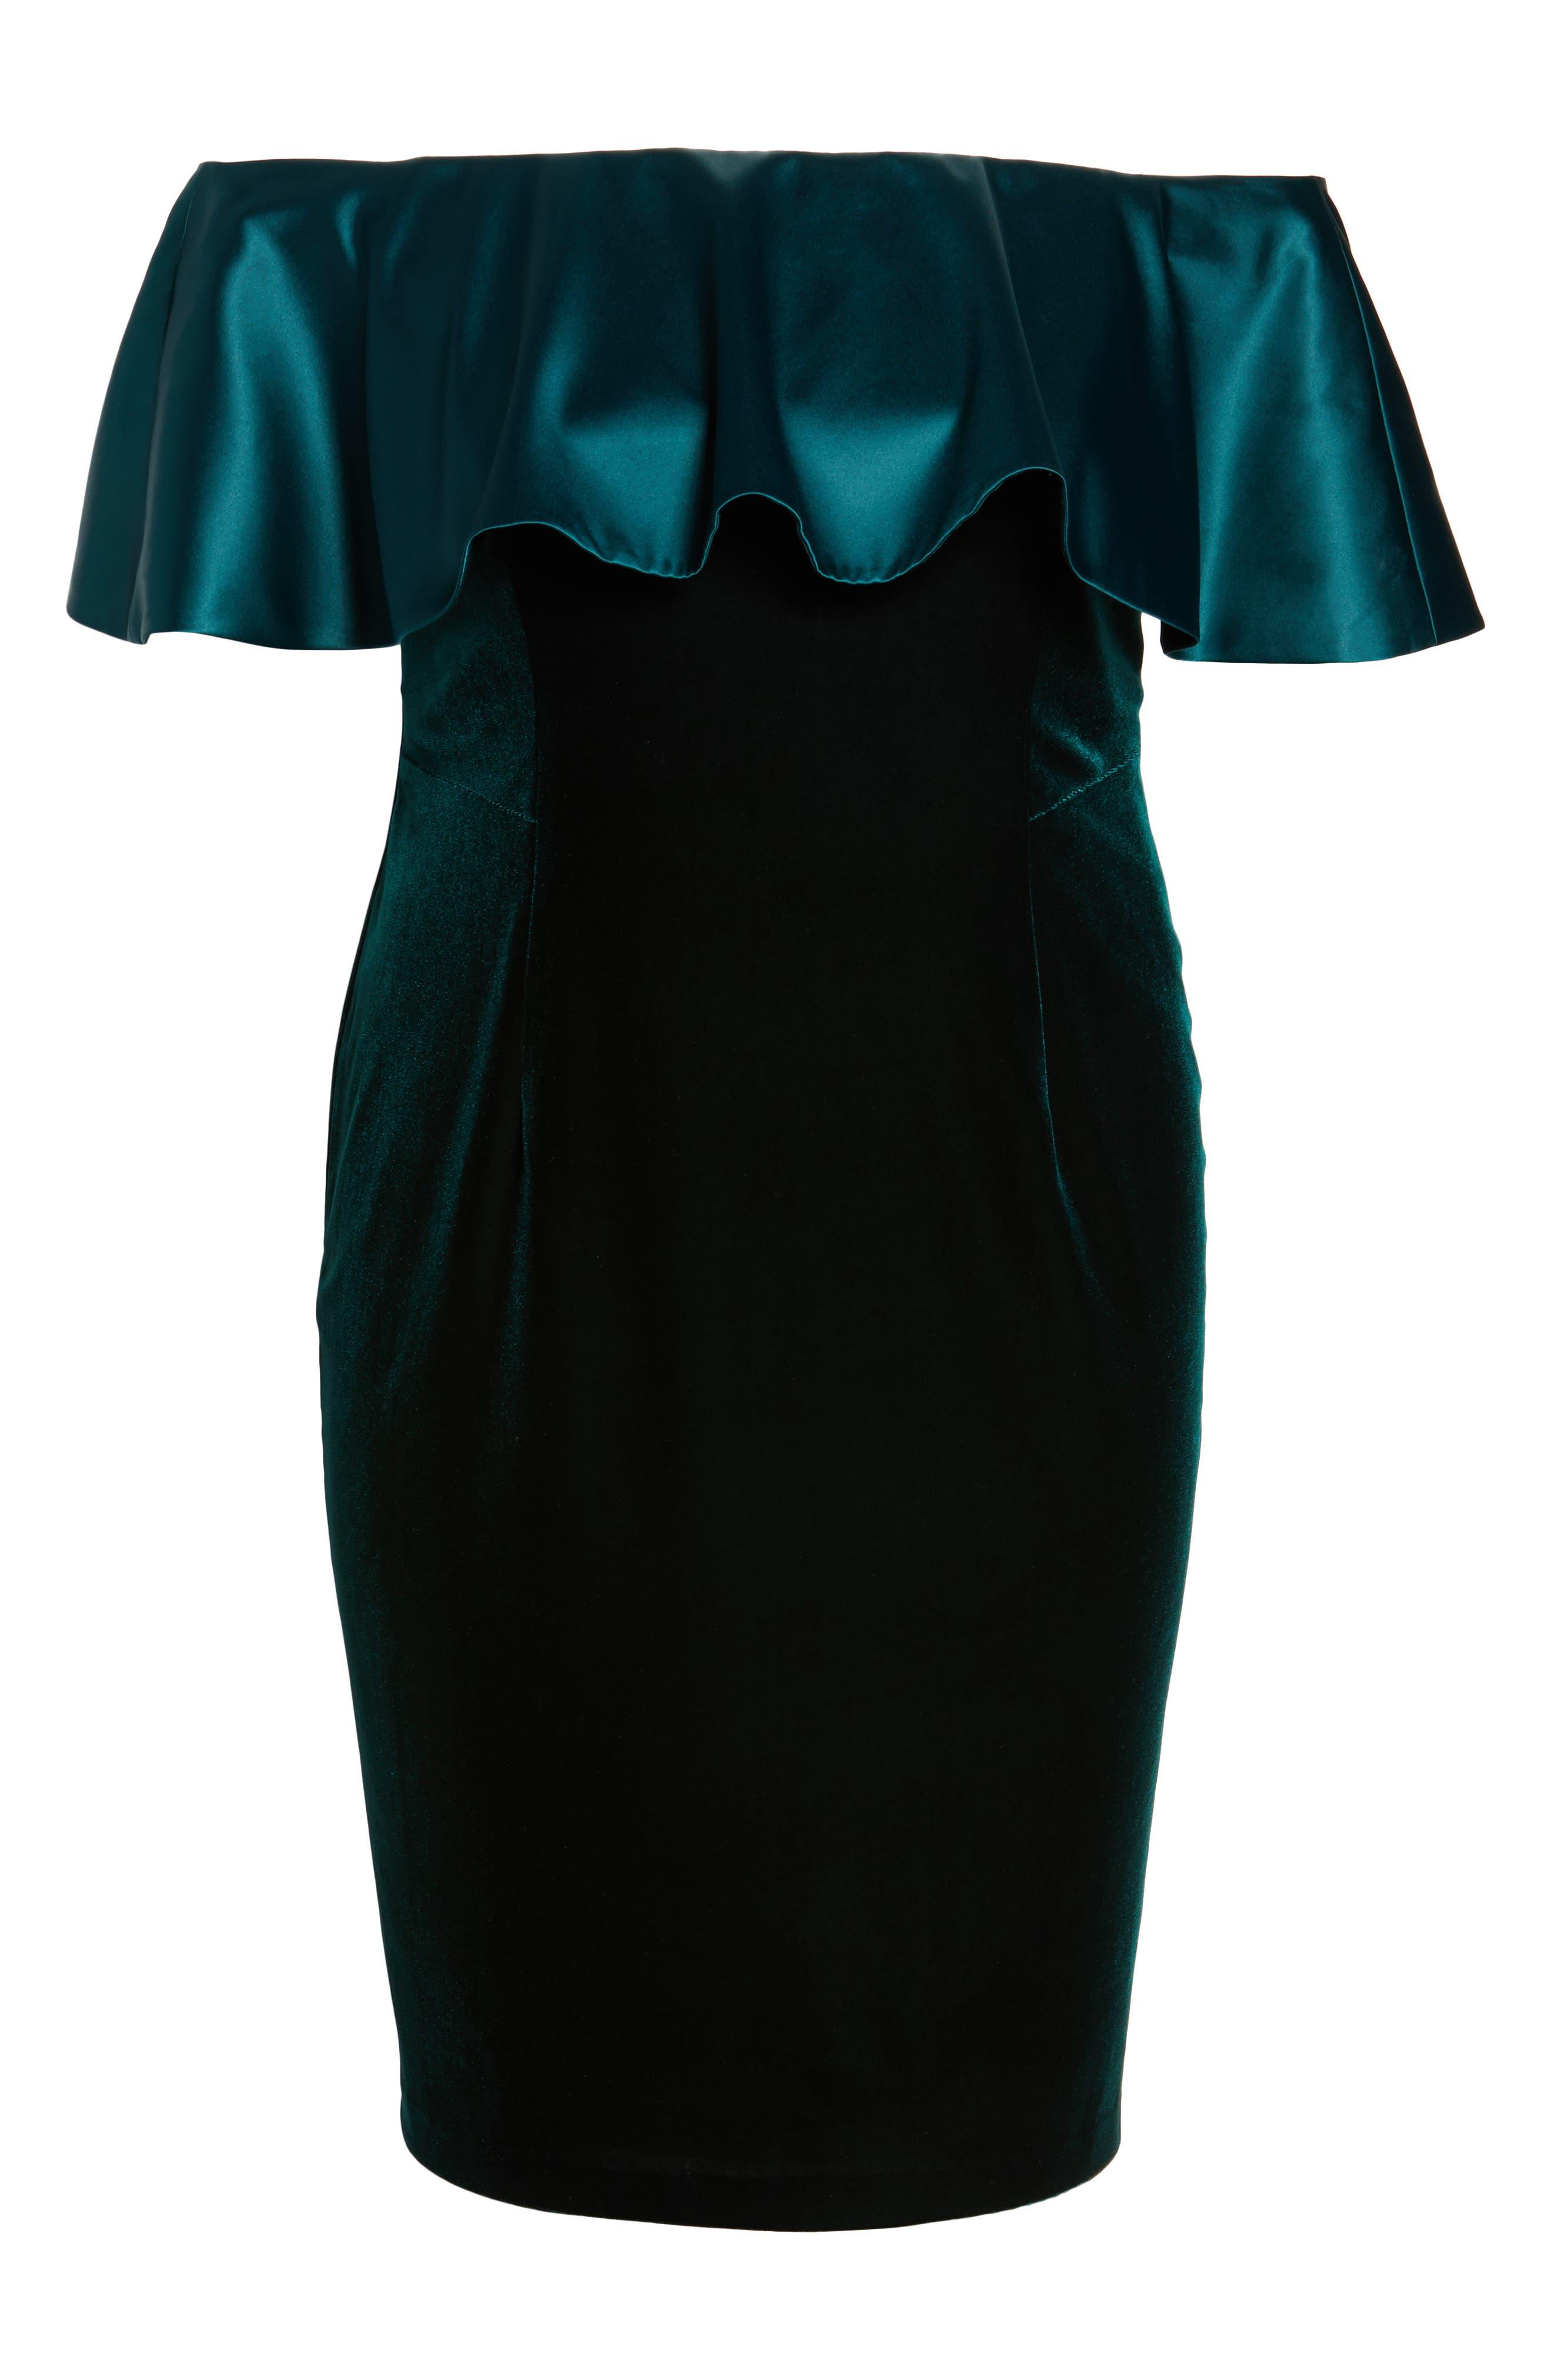 Adriana Papell Stretch Velvet Sheath Dress,                             Alternate thumbnail 6, color,                             321